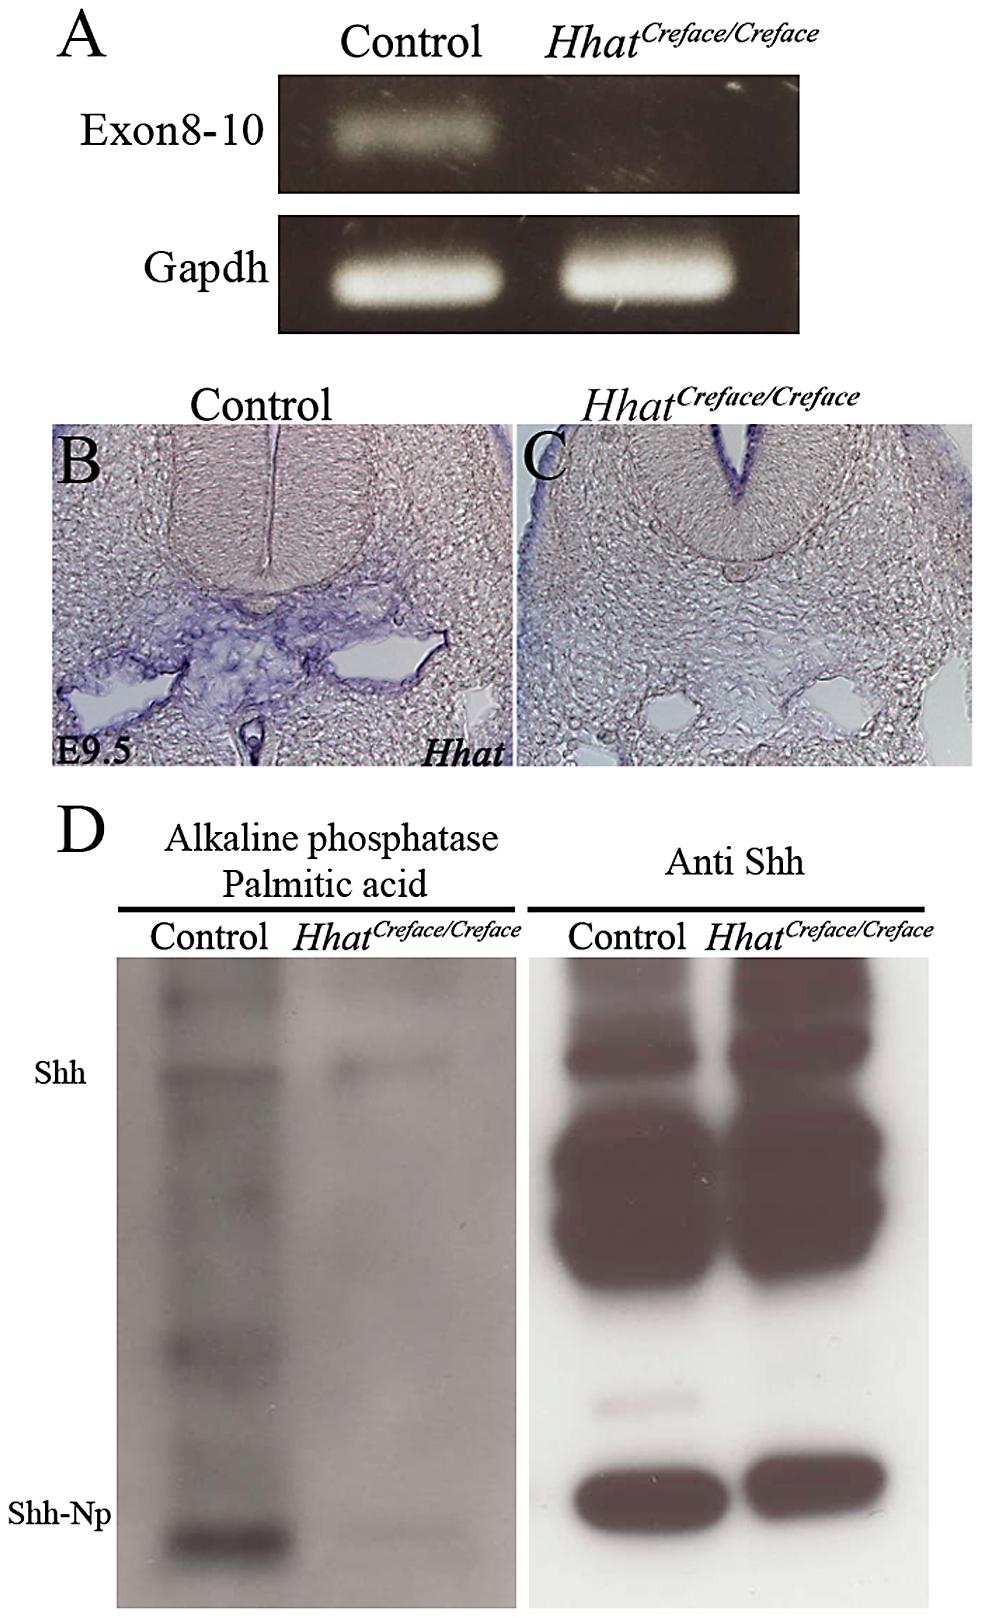 <i>Hhat</i> loss-of-function perturbs gene expression and palmitoylation of <i>Shh.</i>